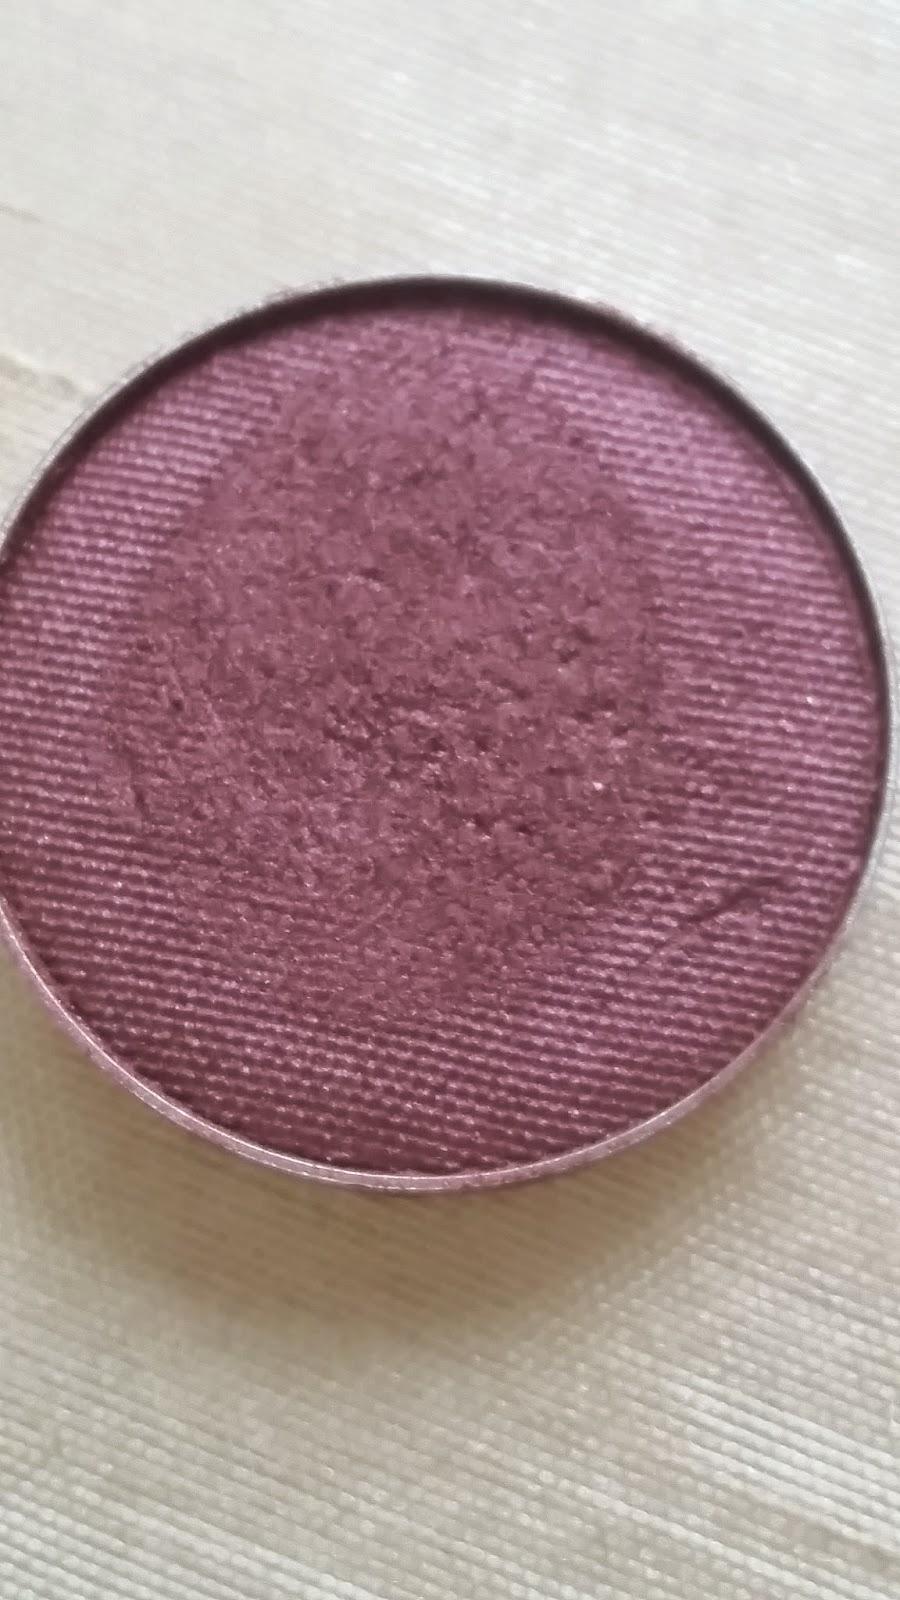 Makeup Geek Burlesque Eye Shadow Review Brokewoman Buys